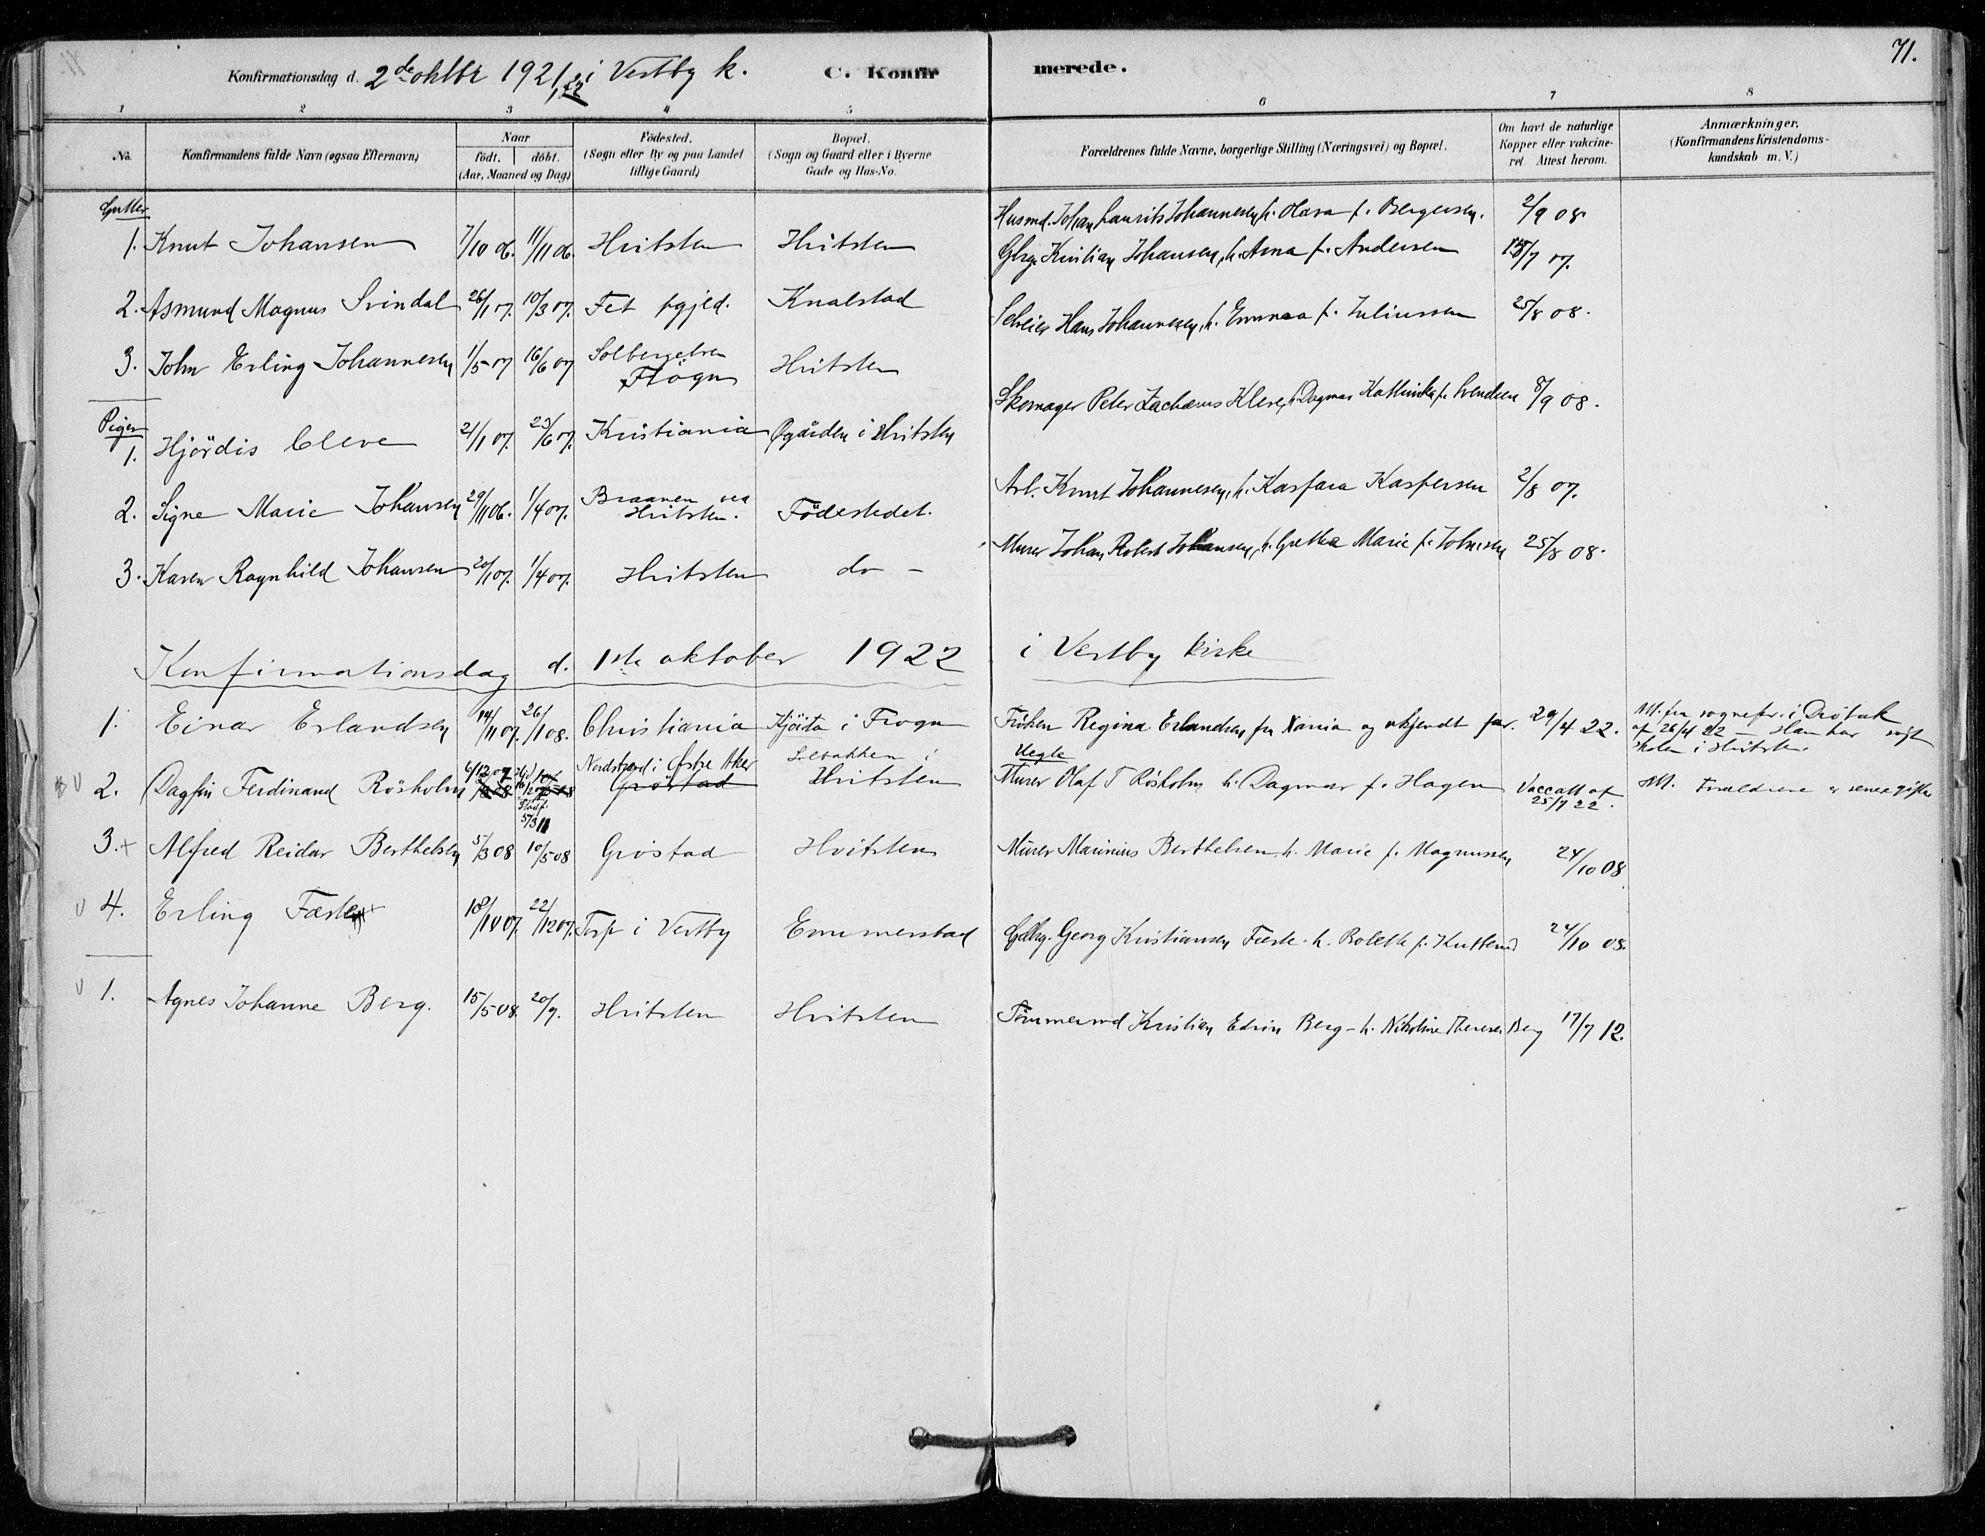 SAO, Vestby prestekontor Kirkebøker, F/Fd/L0001: Ministerialbok nr. IV 1, 1878-1945, s. 71